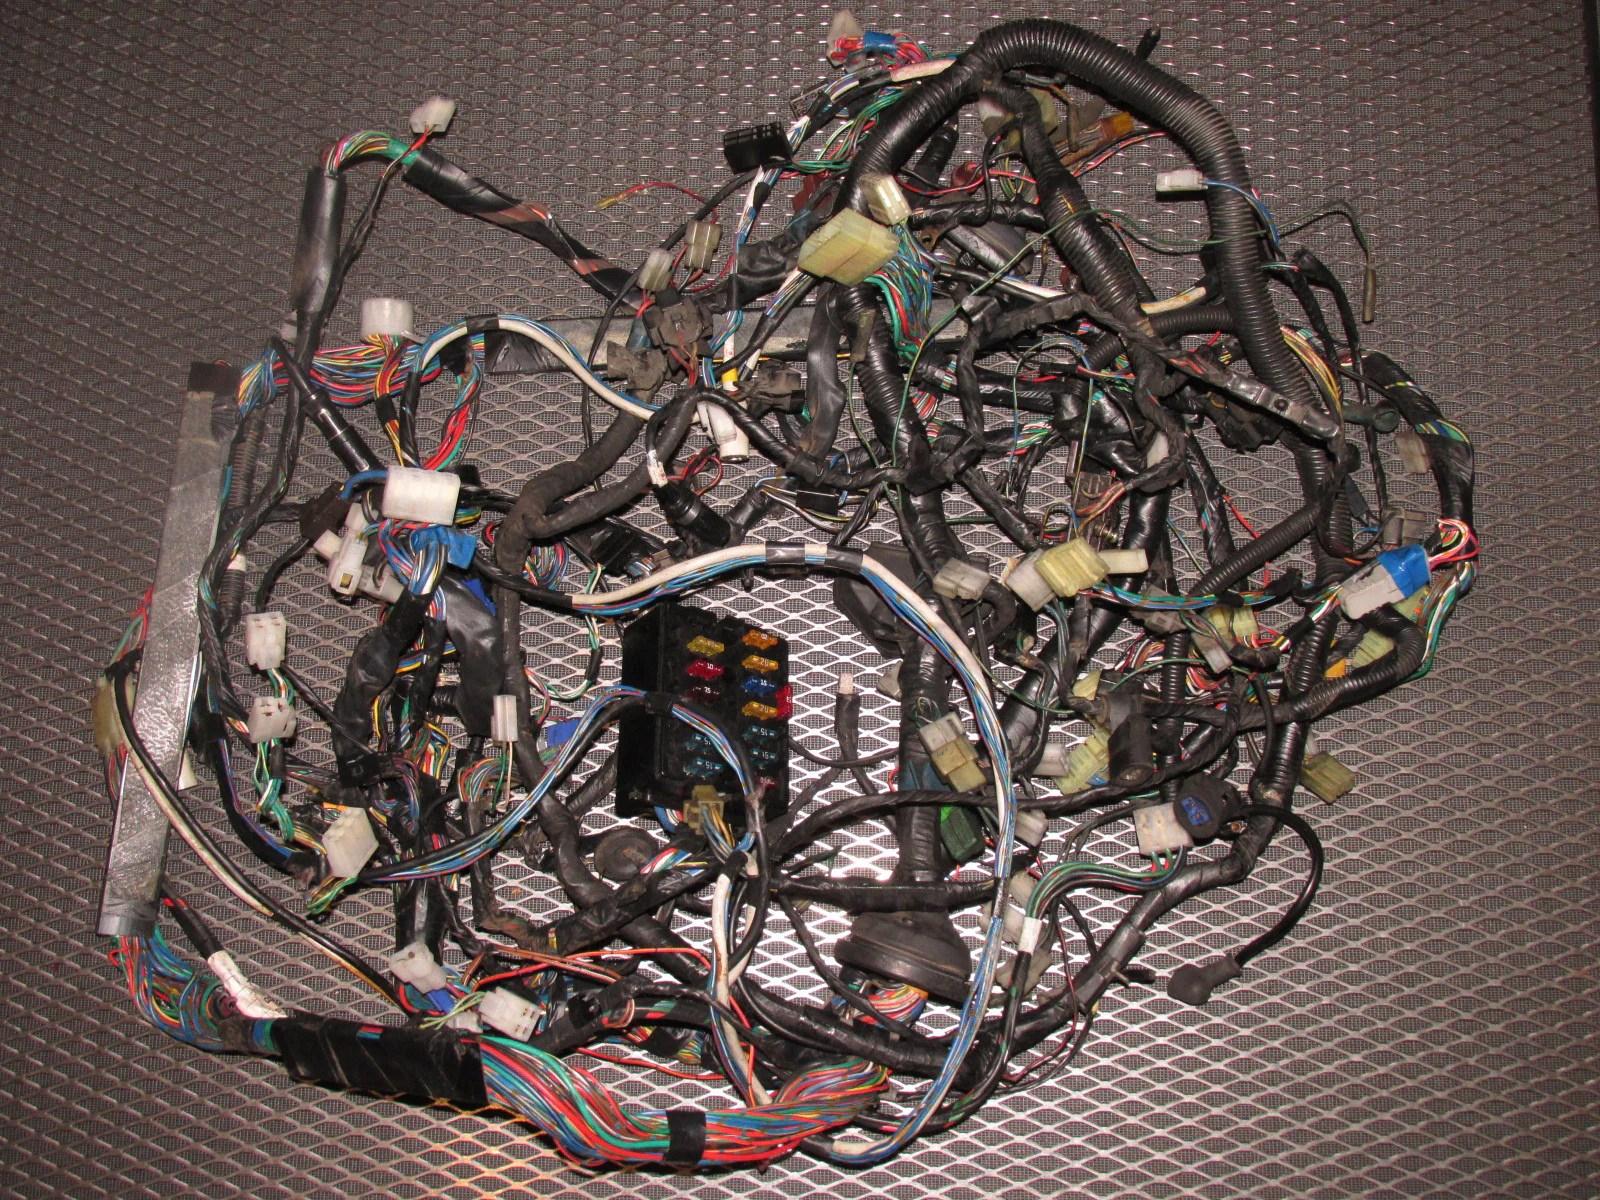 medium resolution of home 84 85 mazda rx7 oem engine computer headlight wiring harness product image